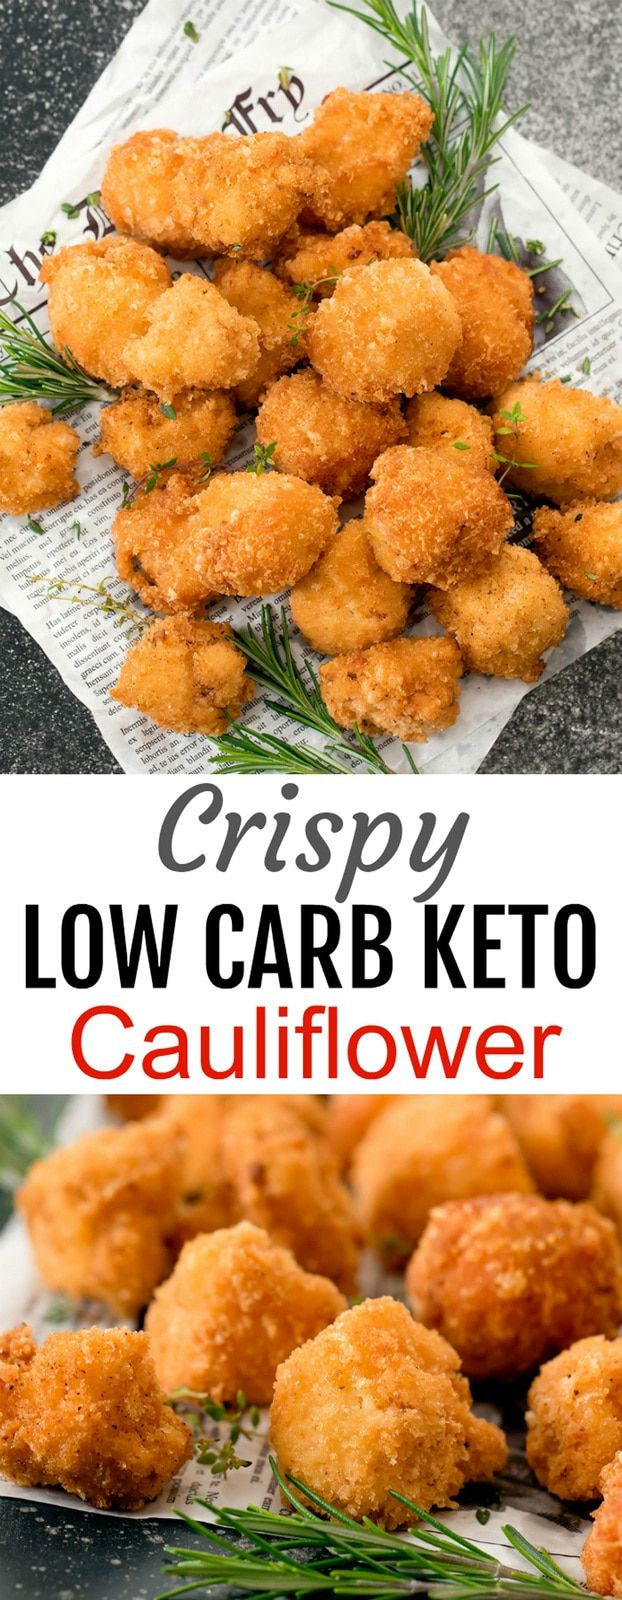 Crispy Low Carb Keto Cauliflower Bites. These cauliflower bites are super crispy and coated…